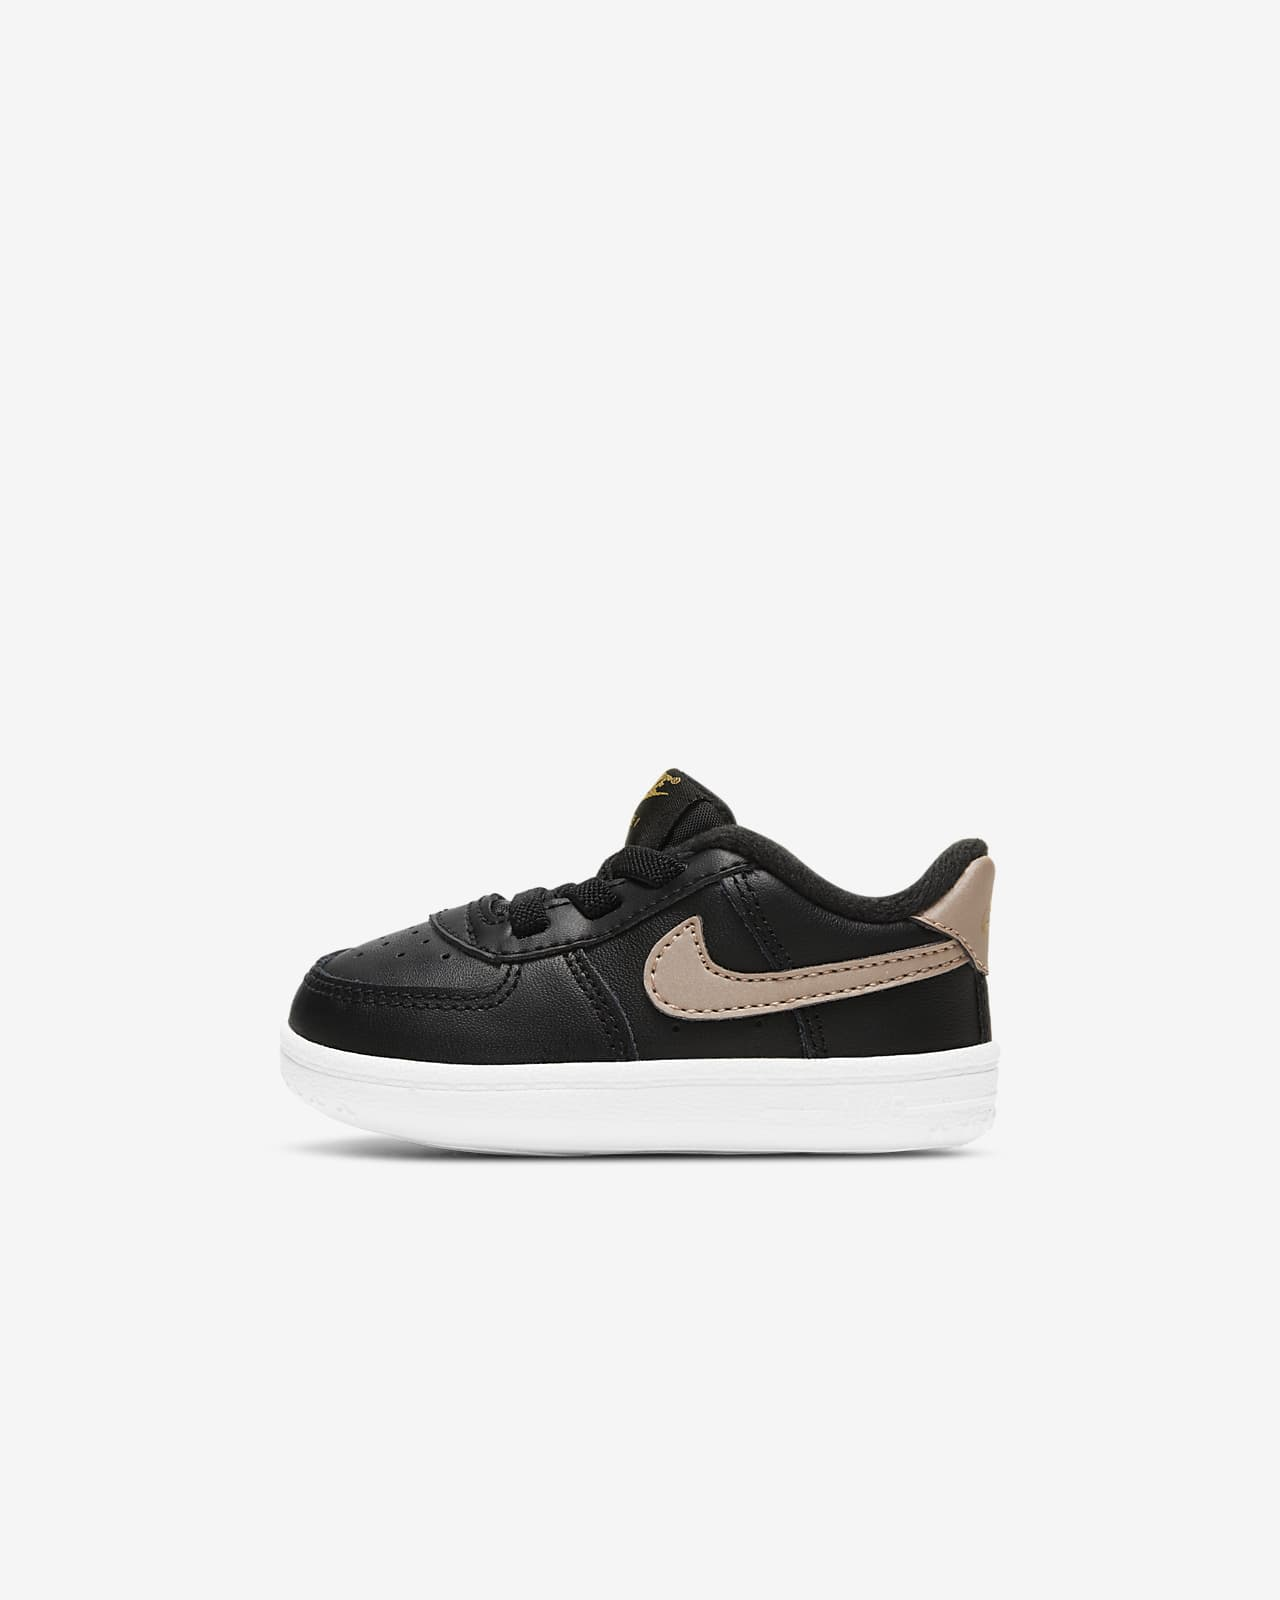 Botička Nike Force 1 Crib pro kojence